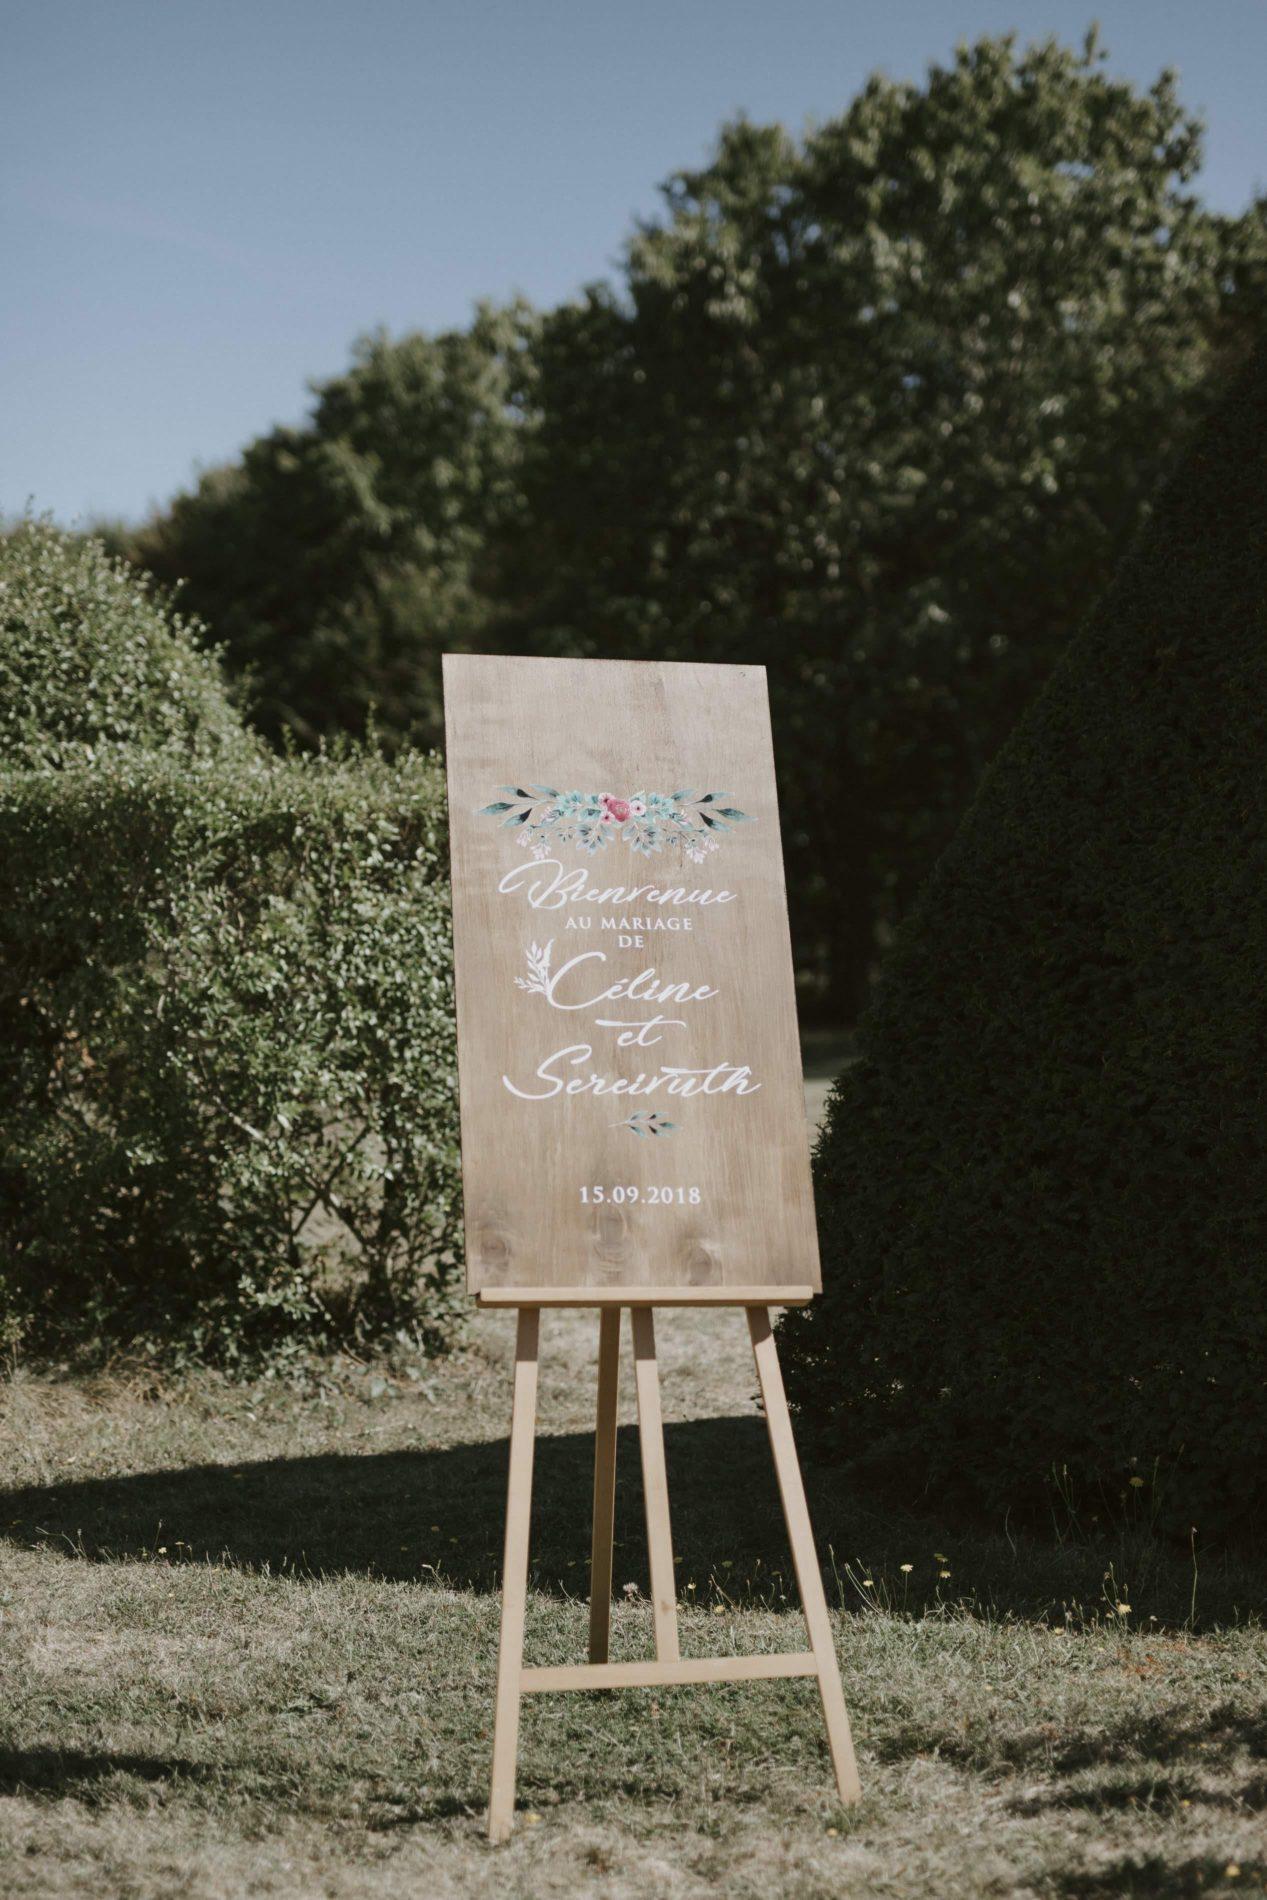 03-CelineSereivuth-10-obonheurdesdames-decoration-mariage-location-Jordane-Chaillou